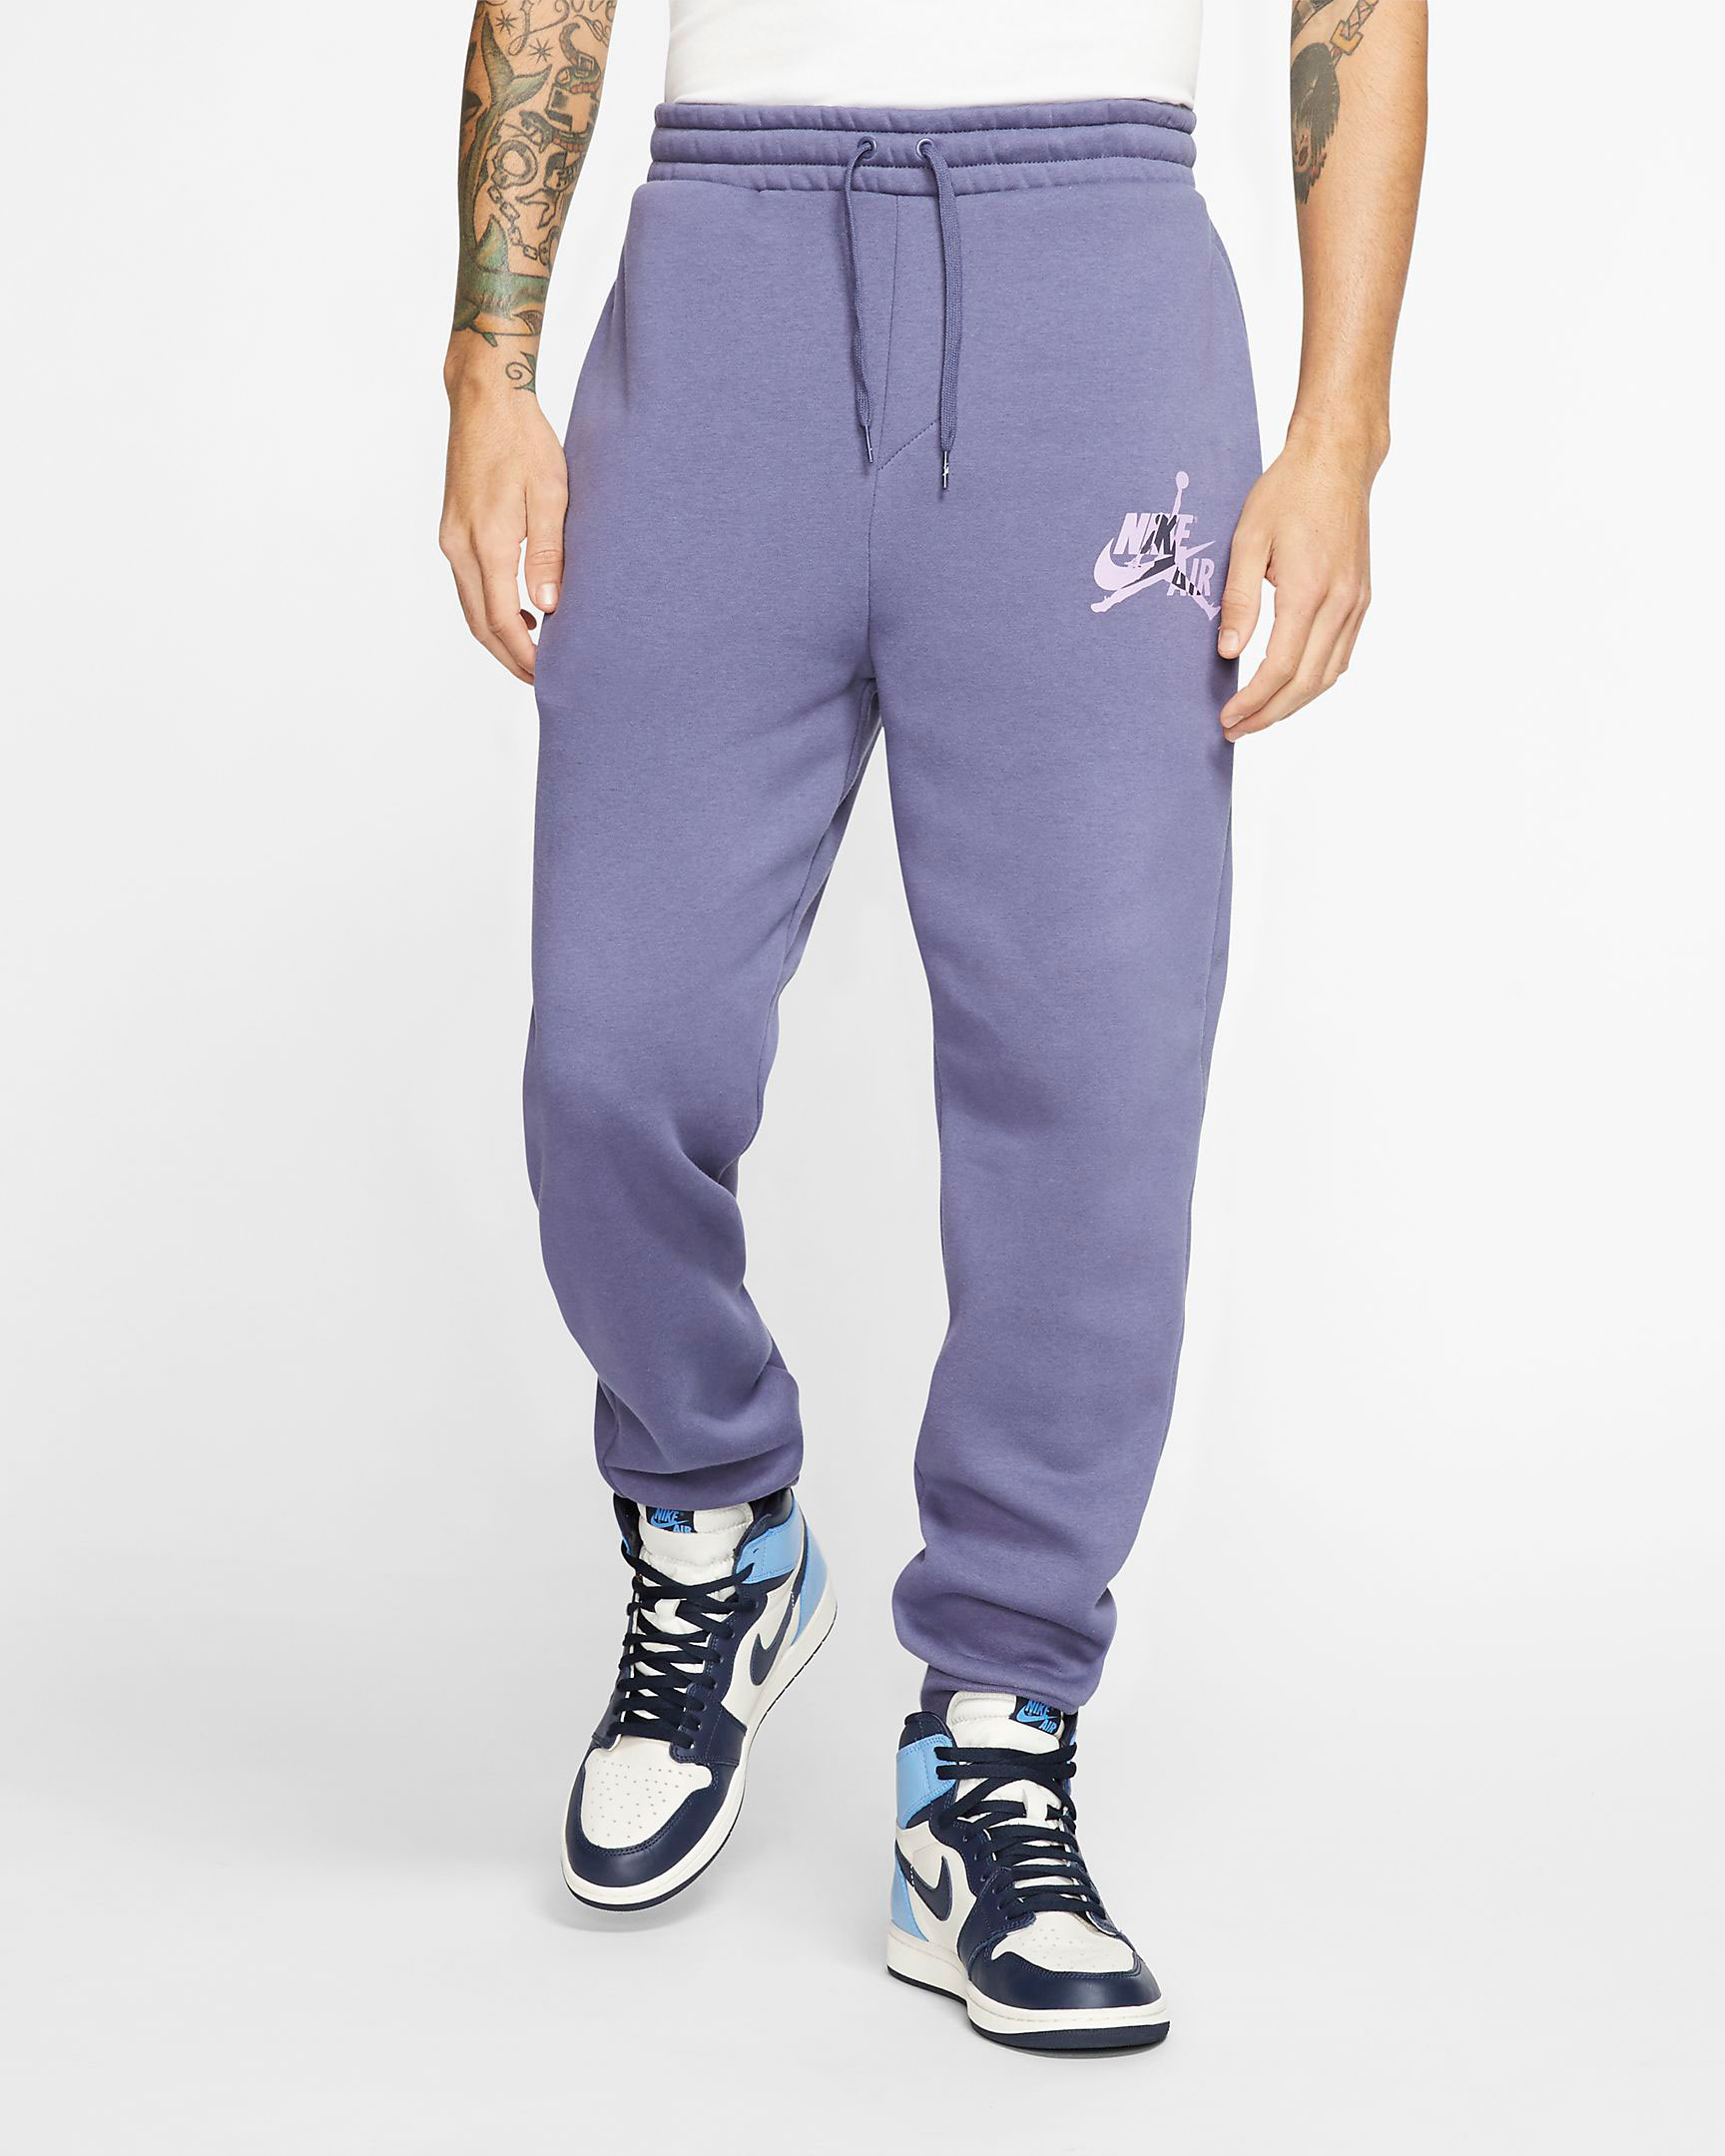 purple-metallic-jordan-4-pants-1